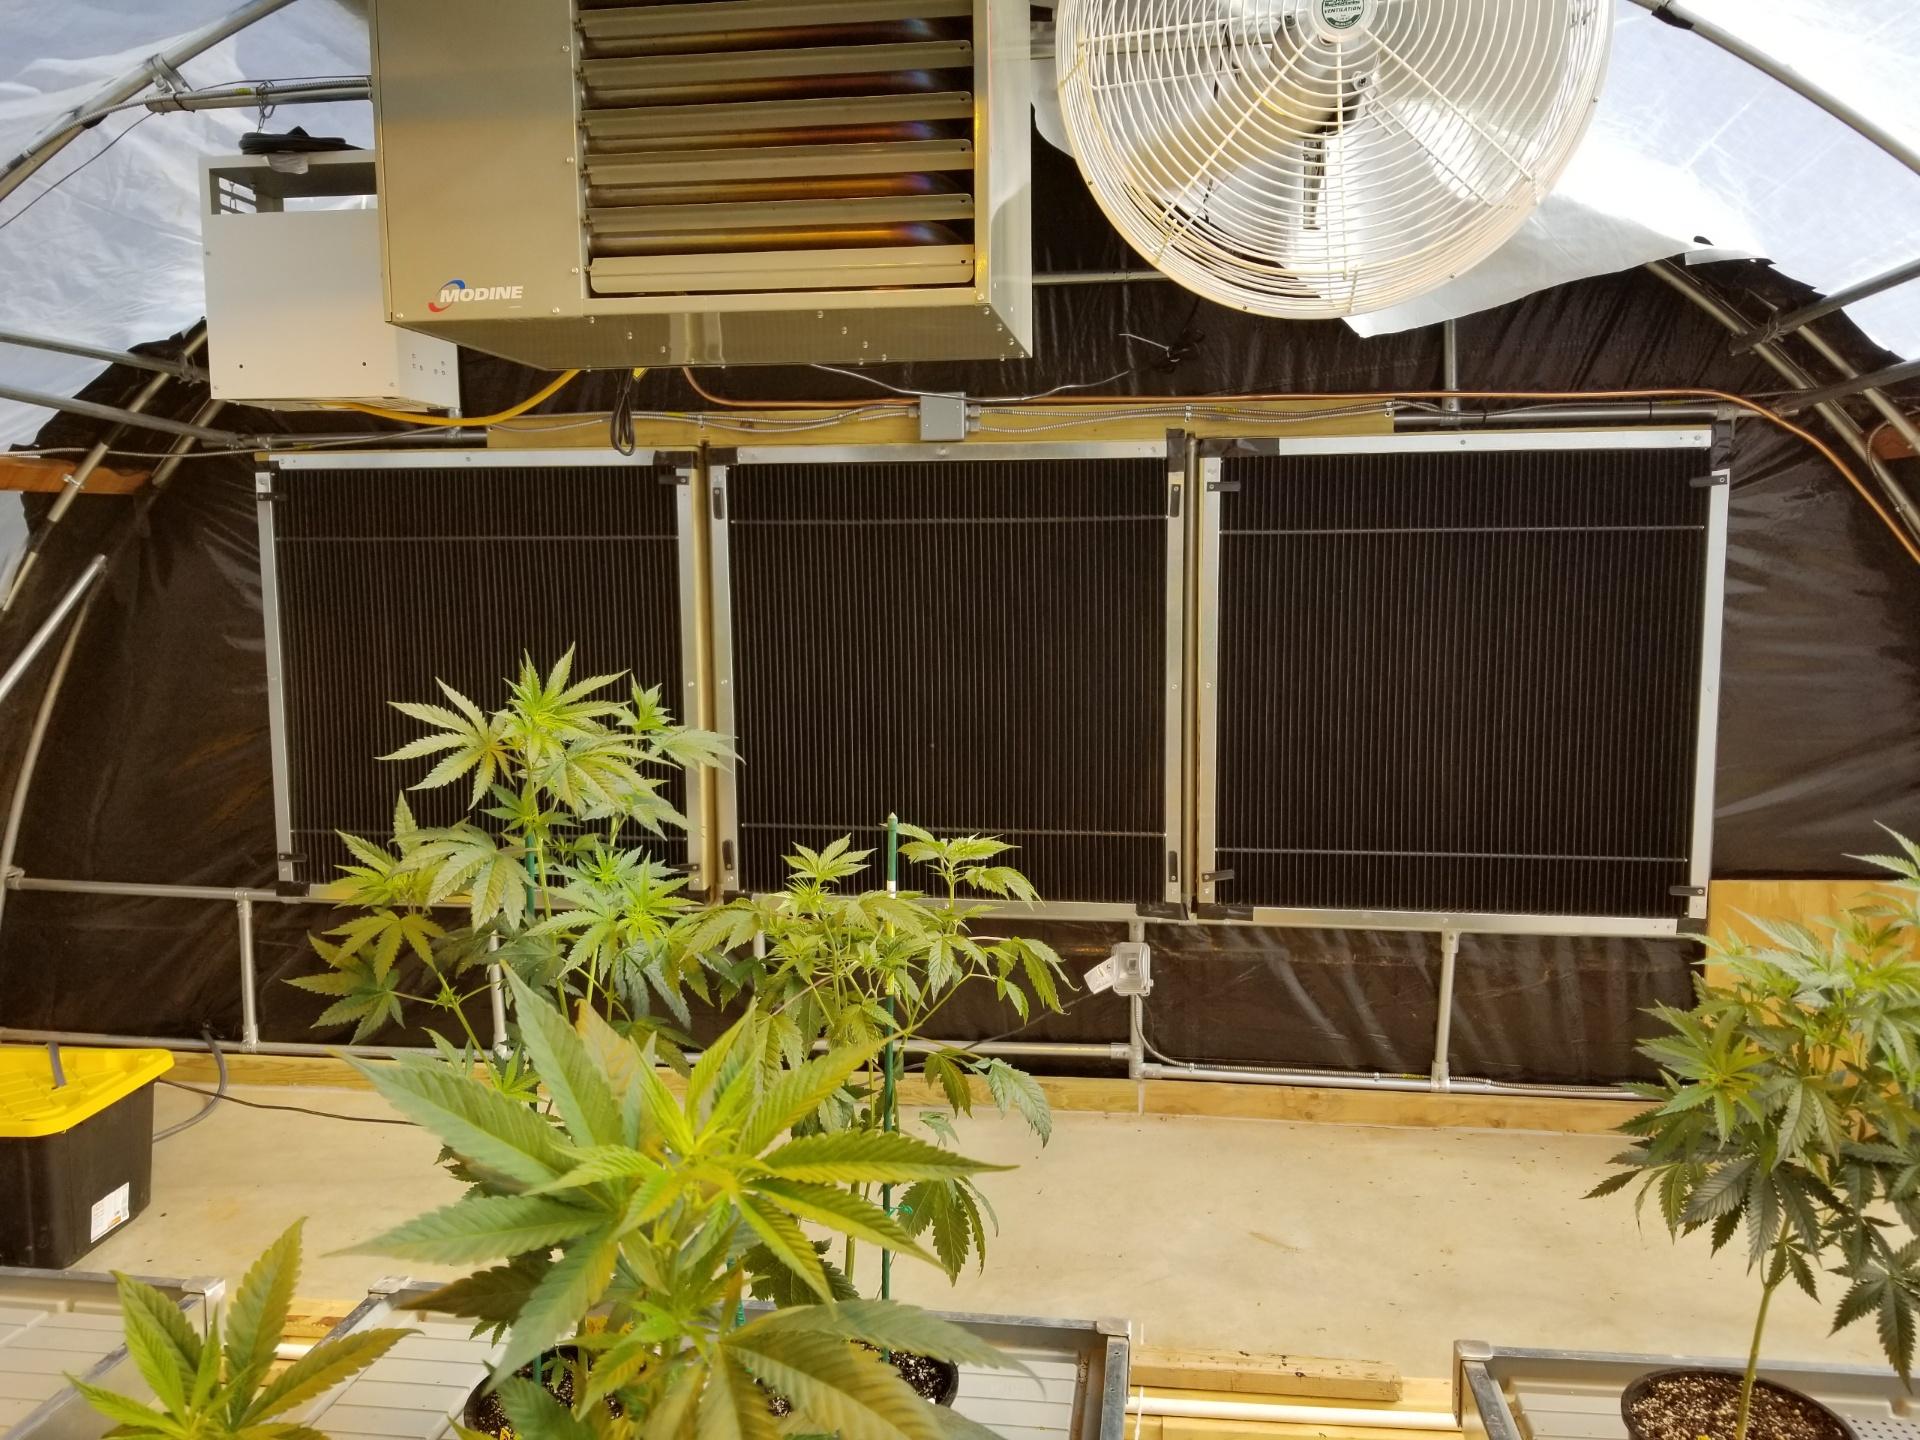 greenhouse-j-d-light-trap-intakes1-factory-fans-direct-888-849-1233.jpeg